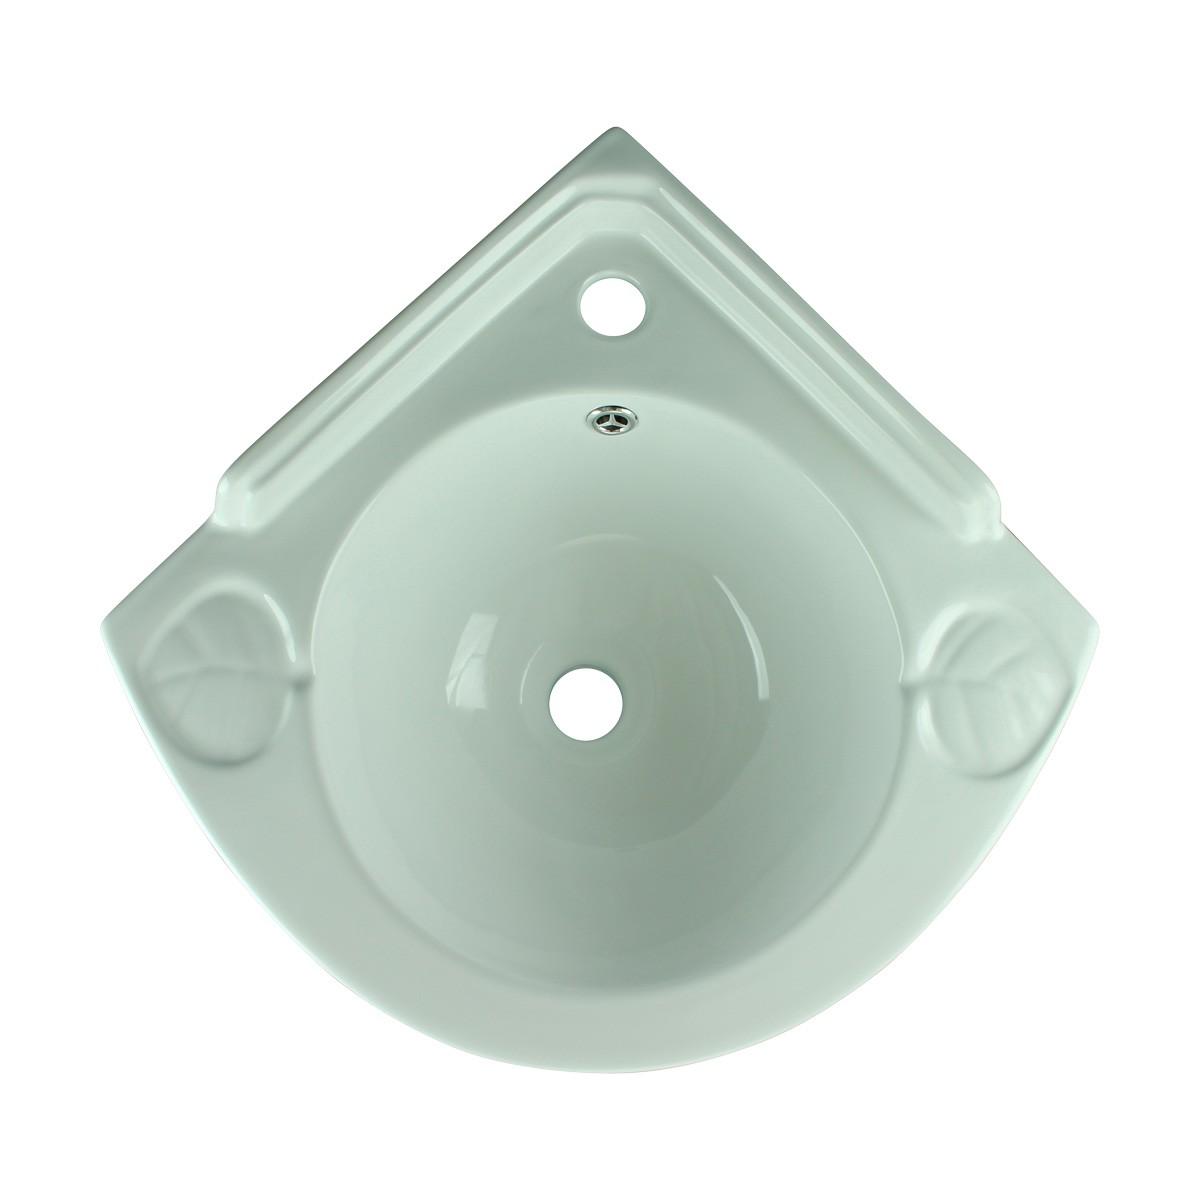 2 Small Corner Wall Mount Sink Bathroom Basin Soap Dishes Set of 2 Corner Sinks wall mounted wash basin Corner Bathroom Sink